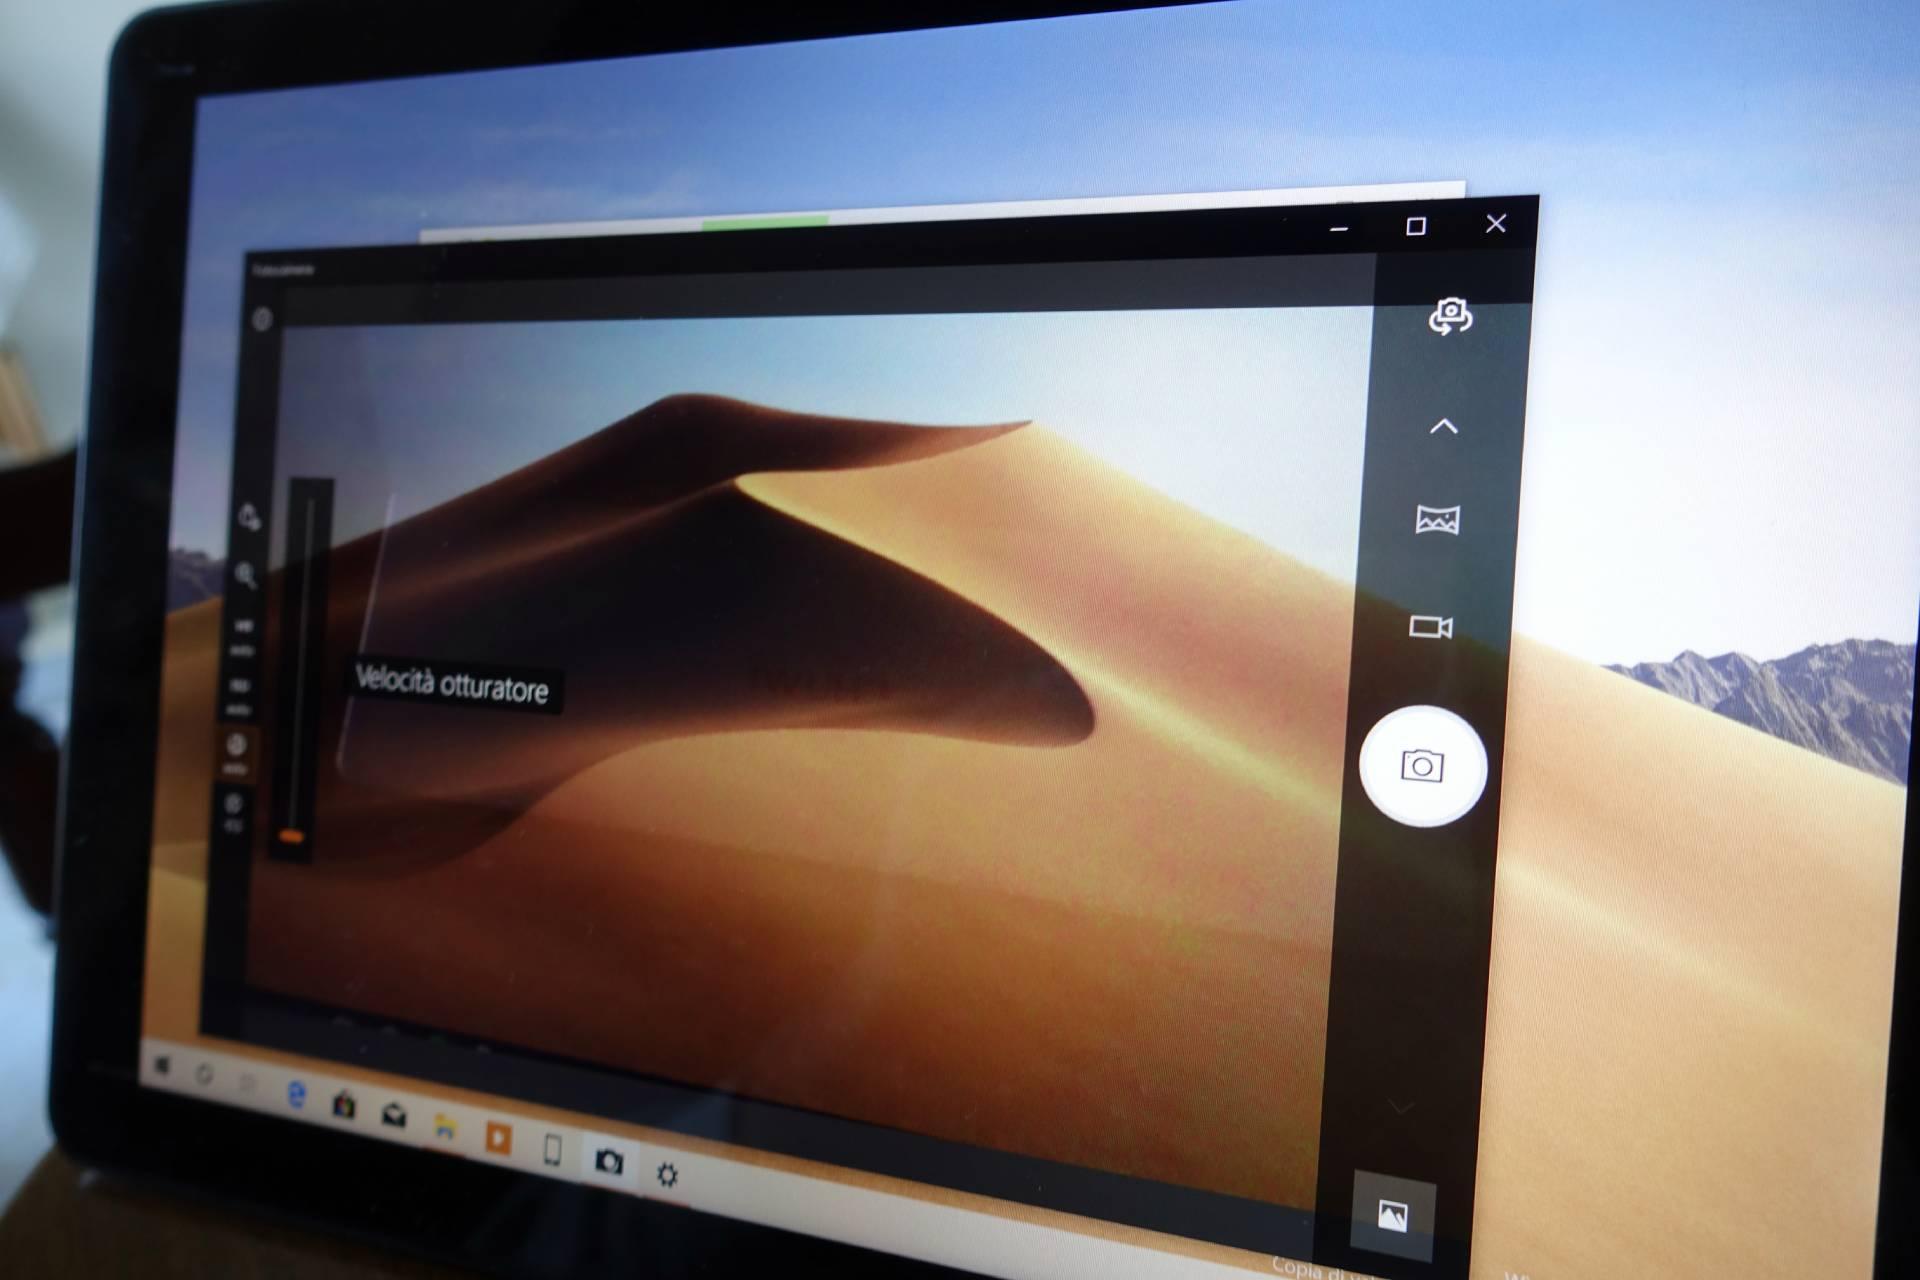 App Fotocamera Windows 10 nuova interfaccia